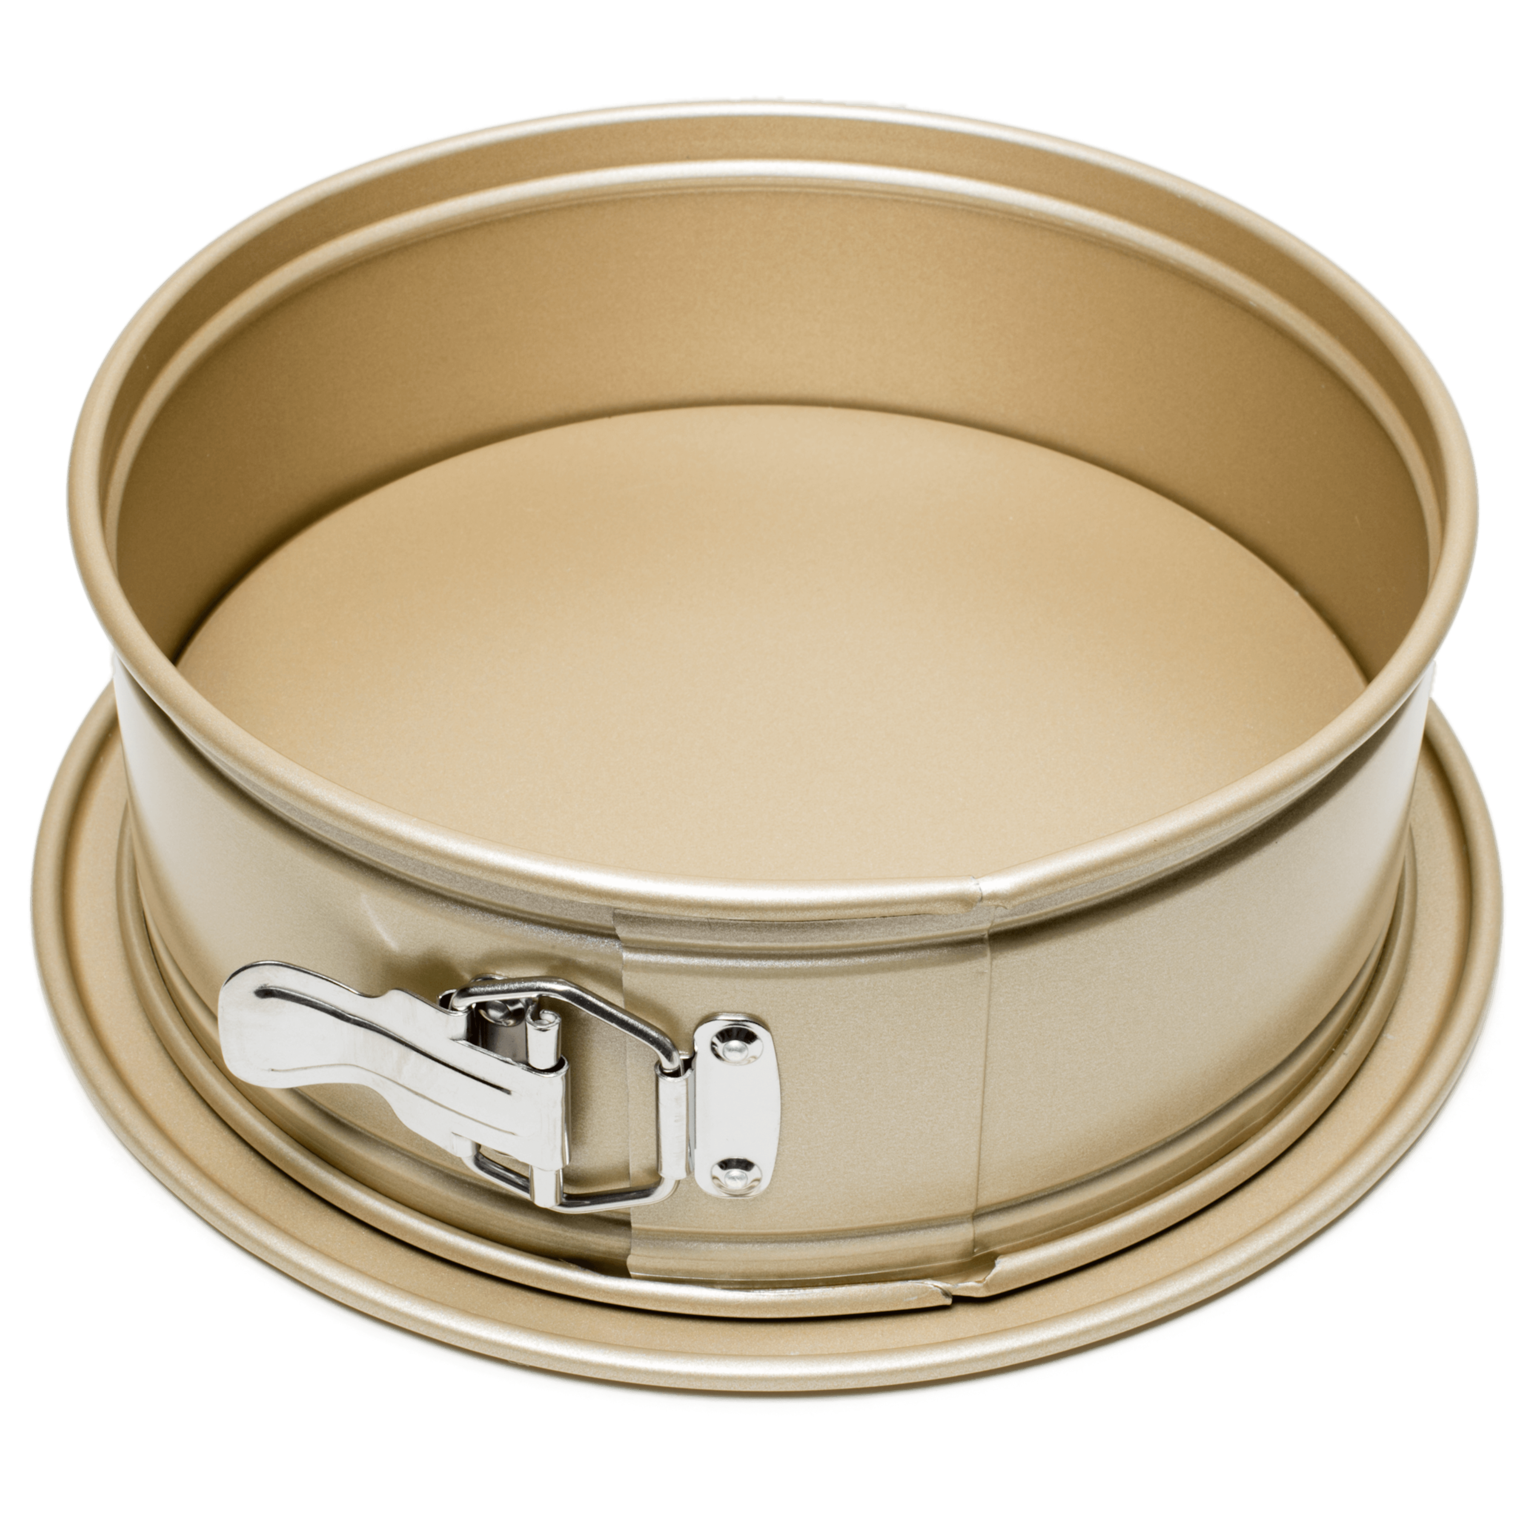 America S Test Kitchen Springform Pan Review